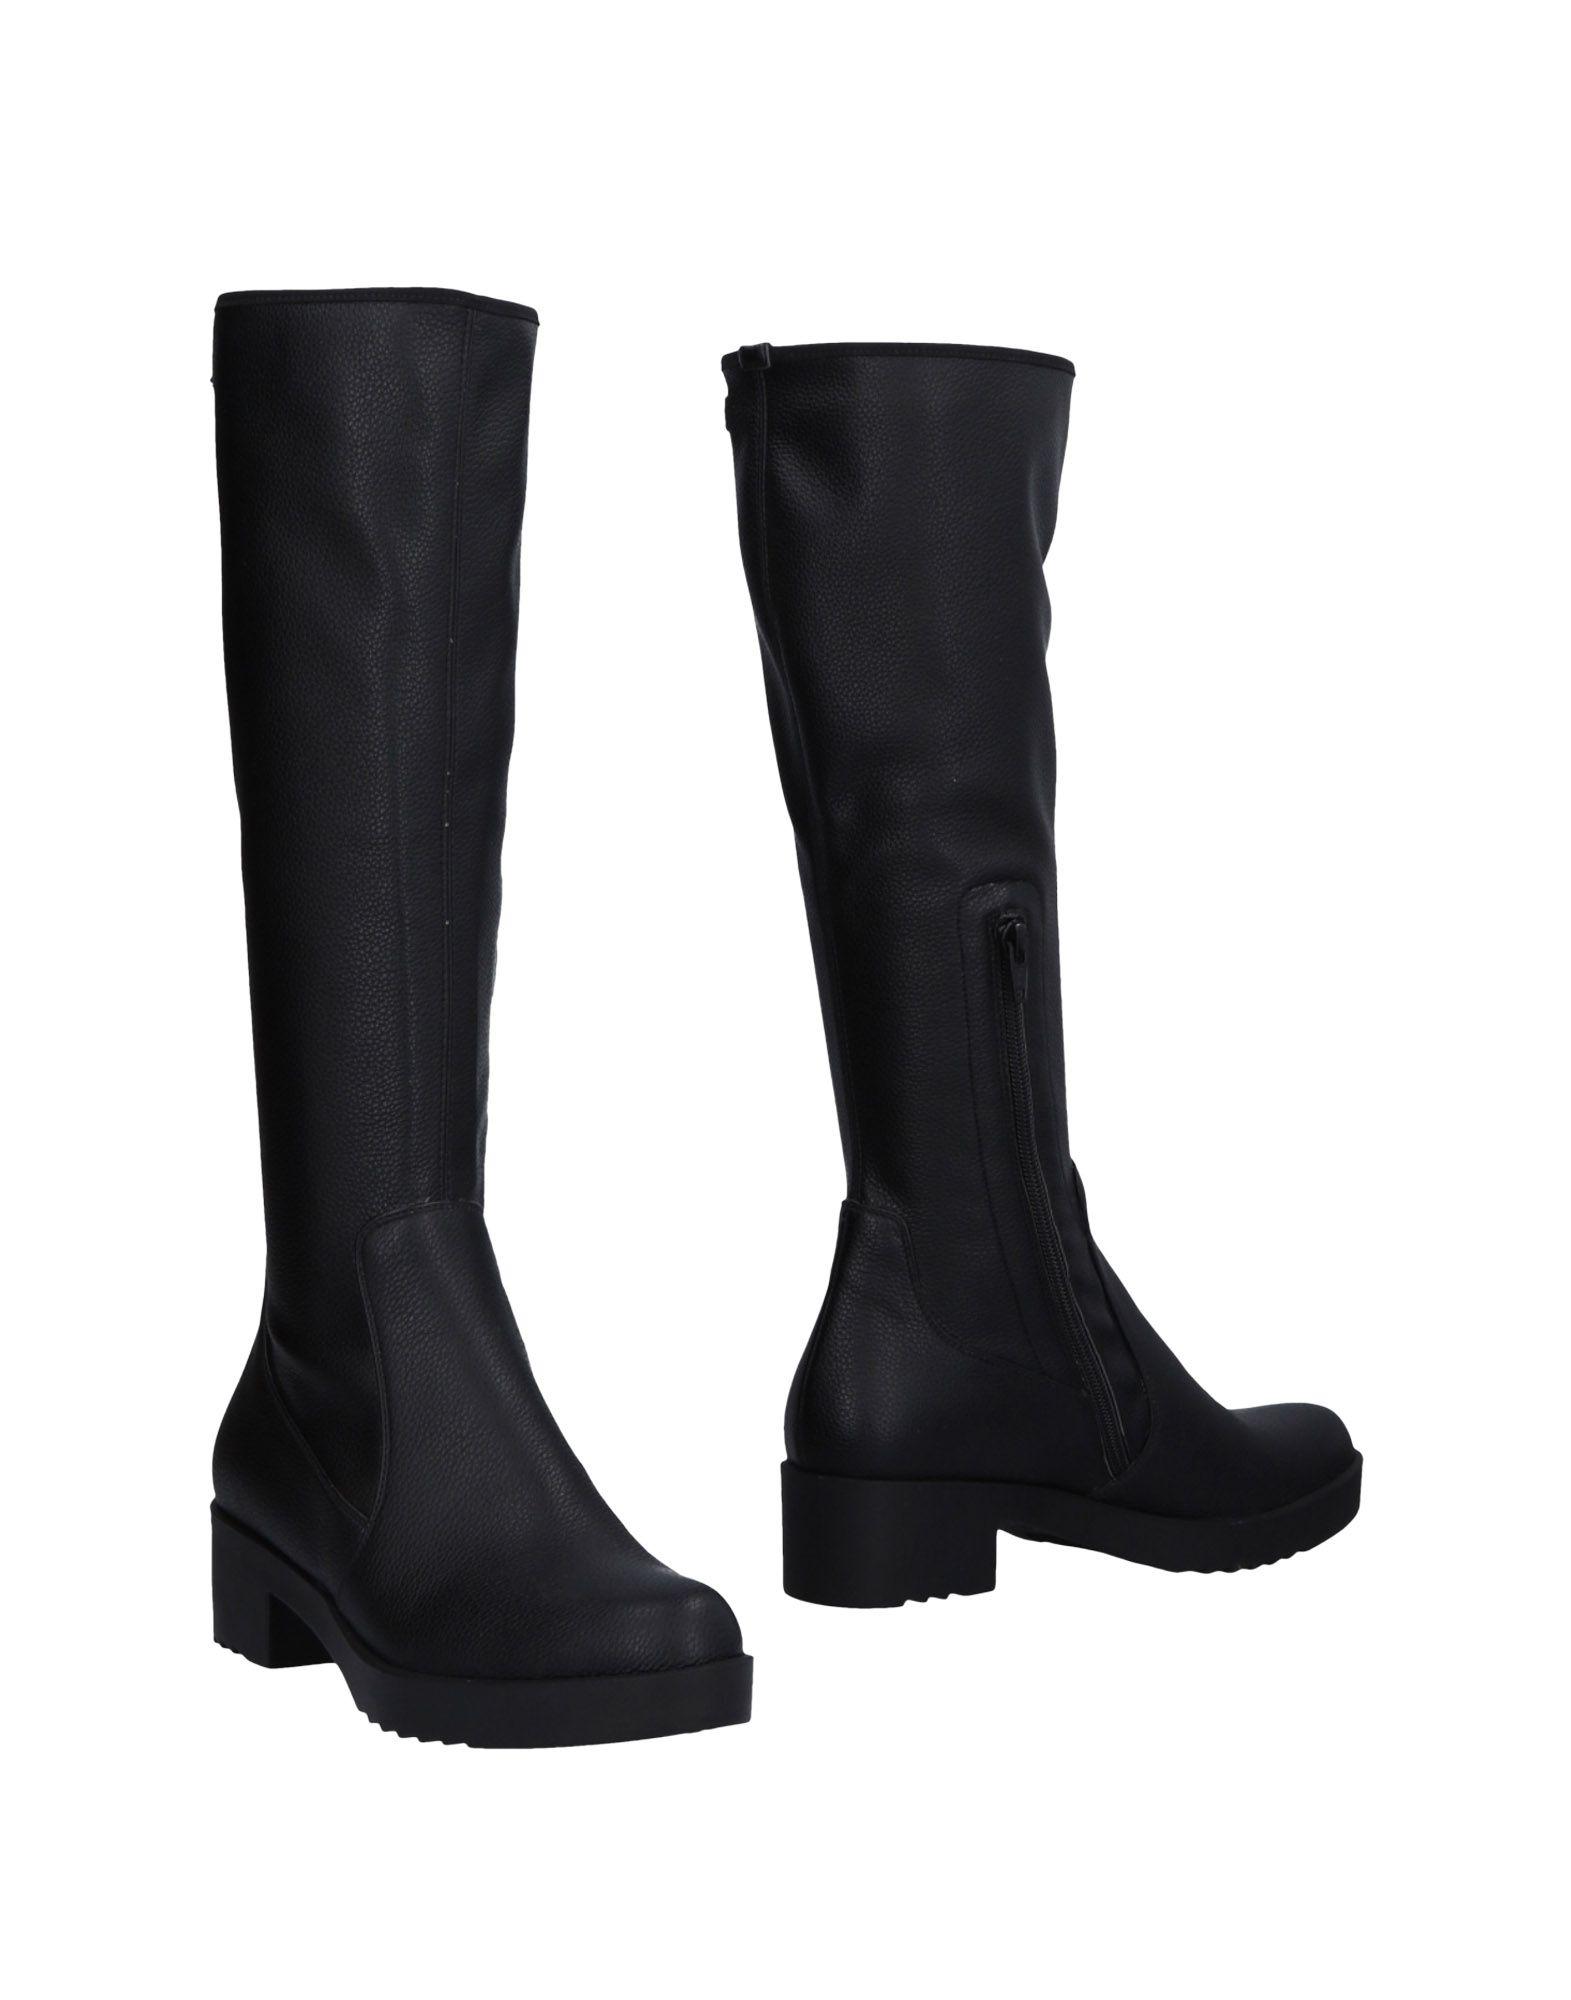 Norma Norma J.Baker Boots - Women Norma Norma J.Baker Boots online on  Canada - 11477004TQ bdafdd